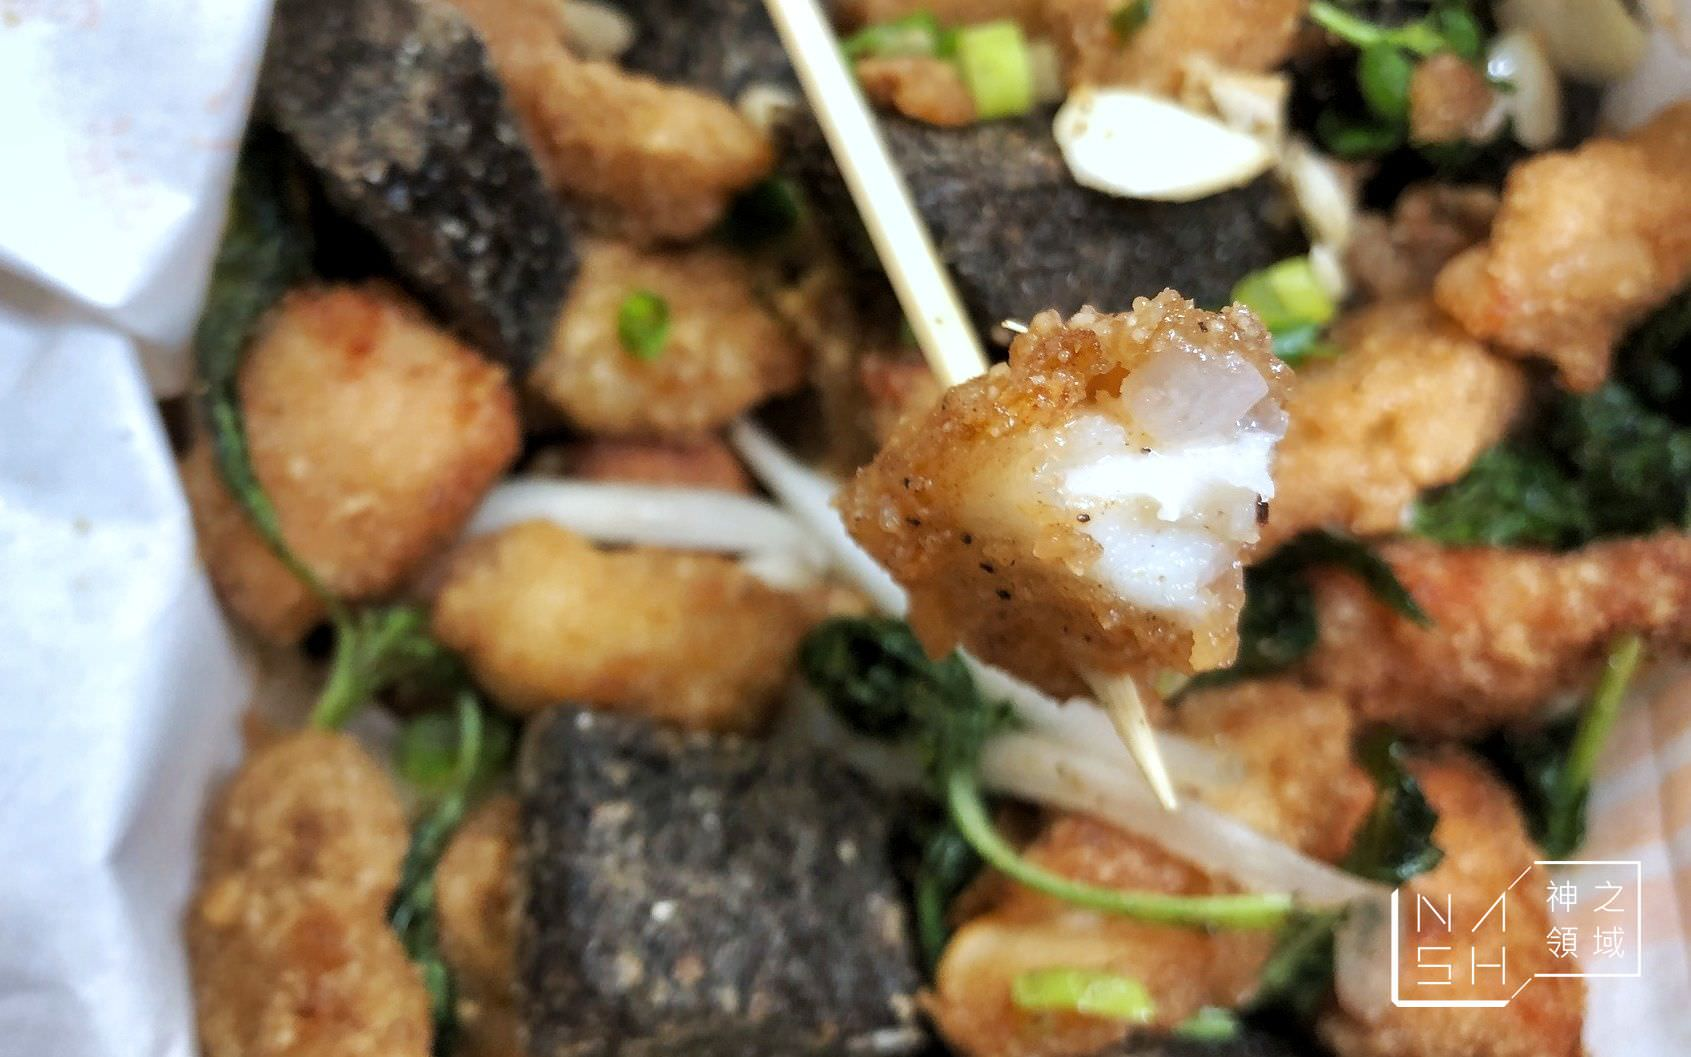 阿牛鹹酥雞